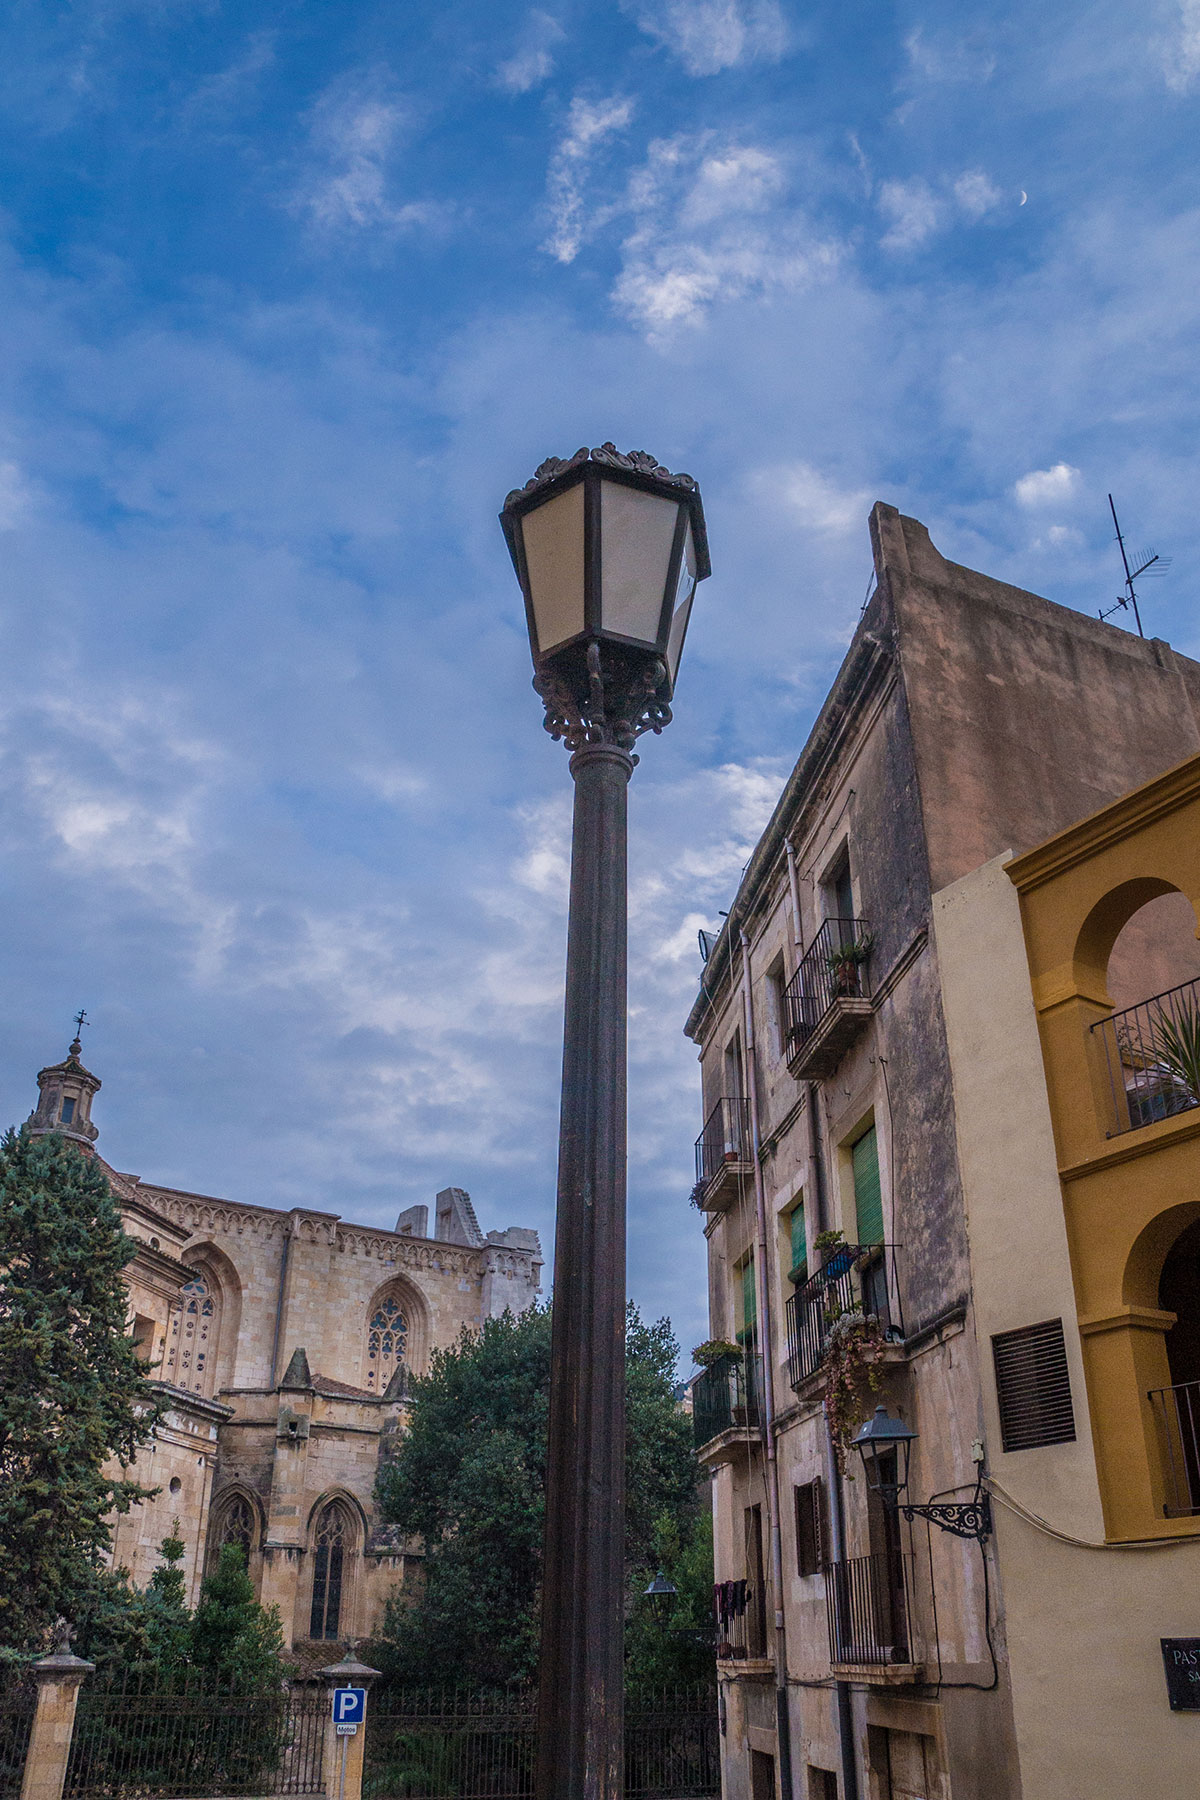 Spanien, Katalonien, Tarragona, Laterne